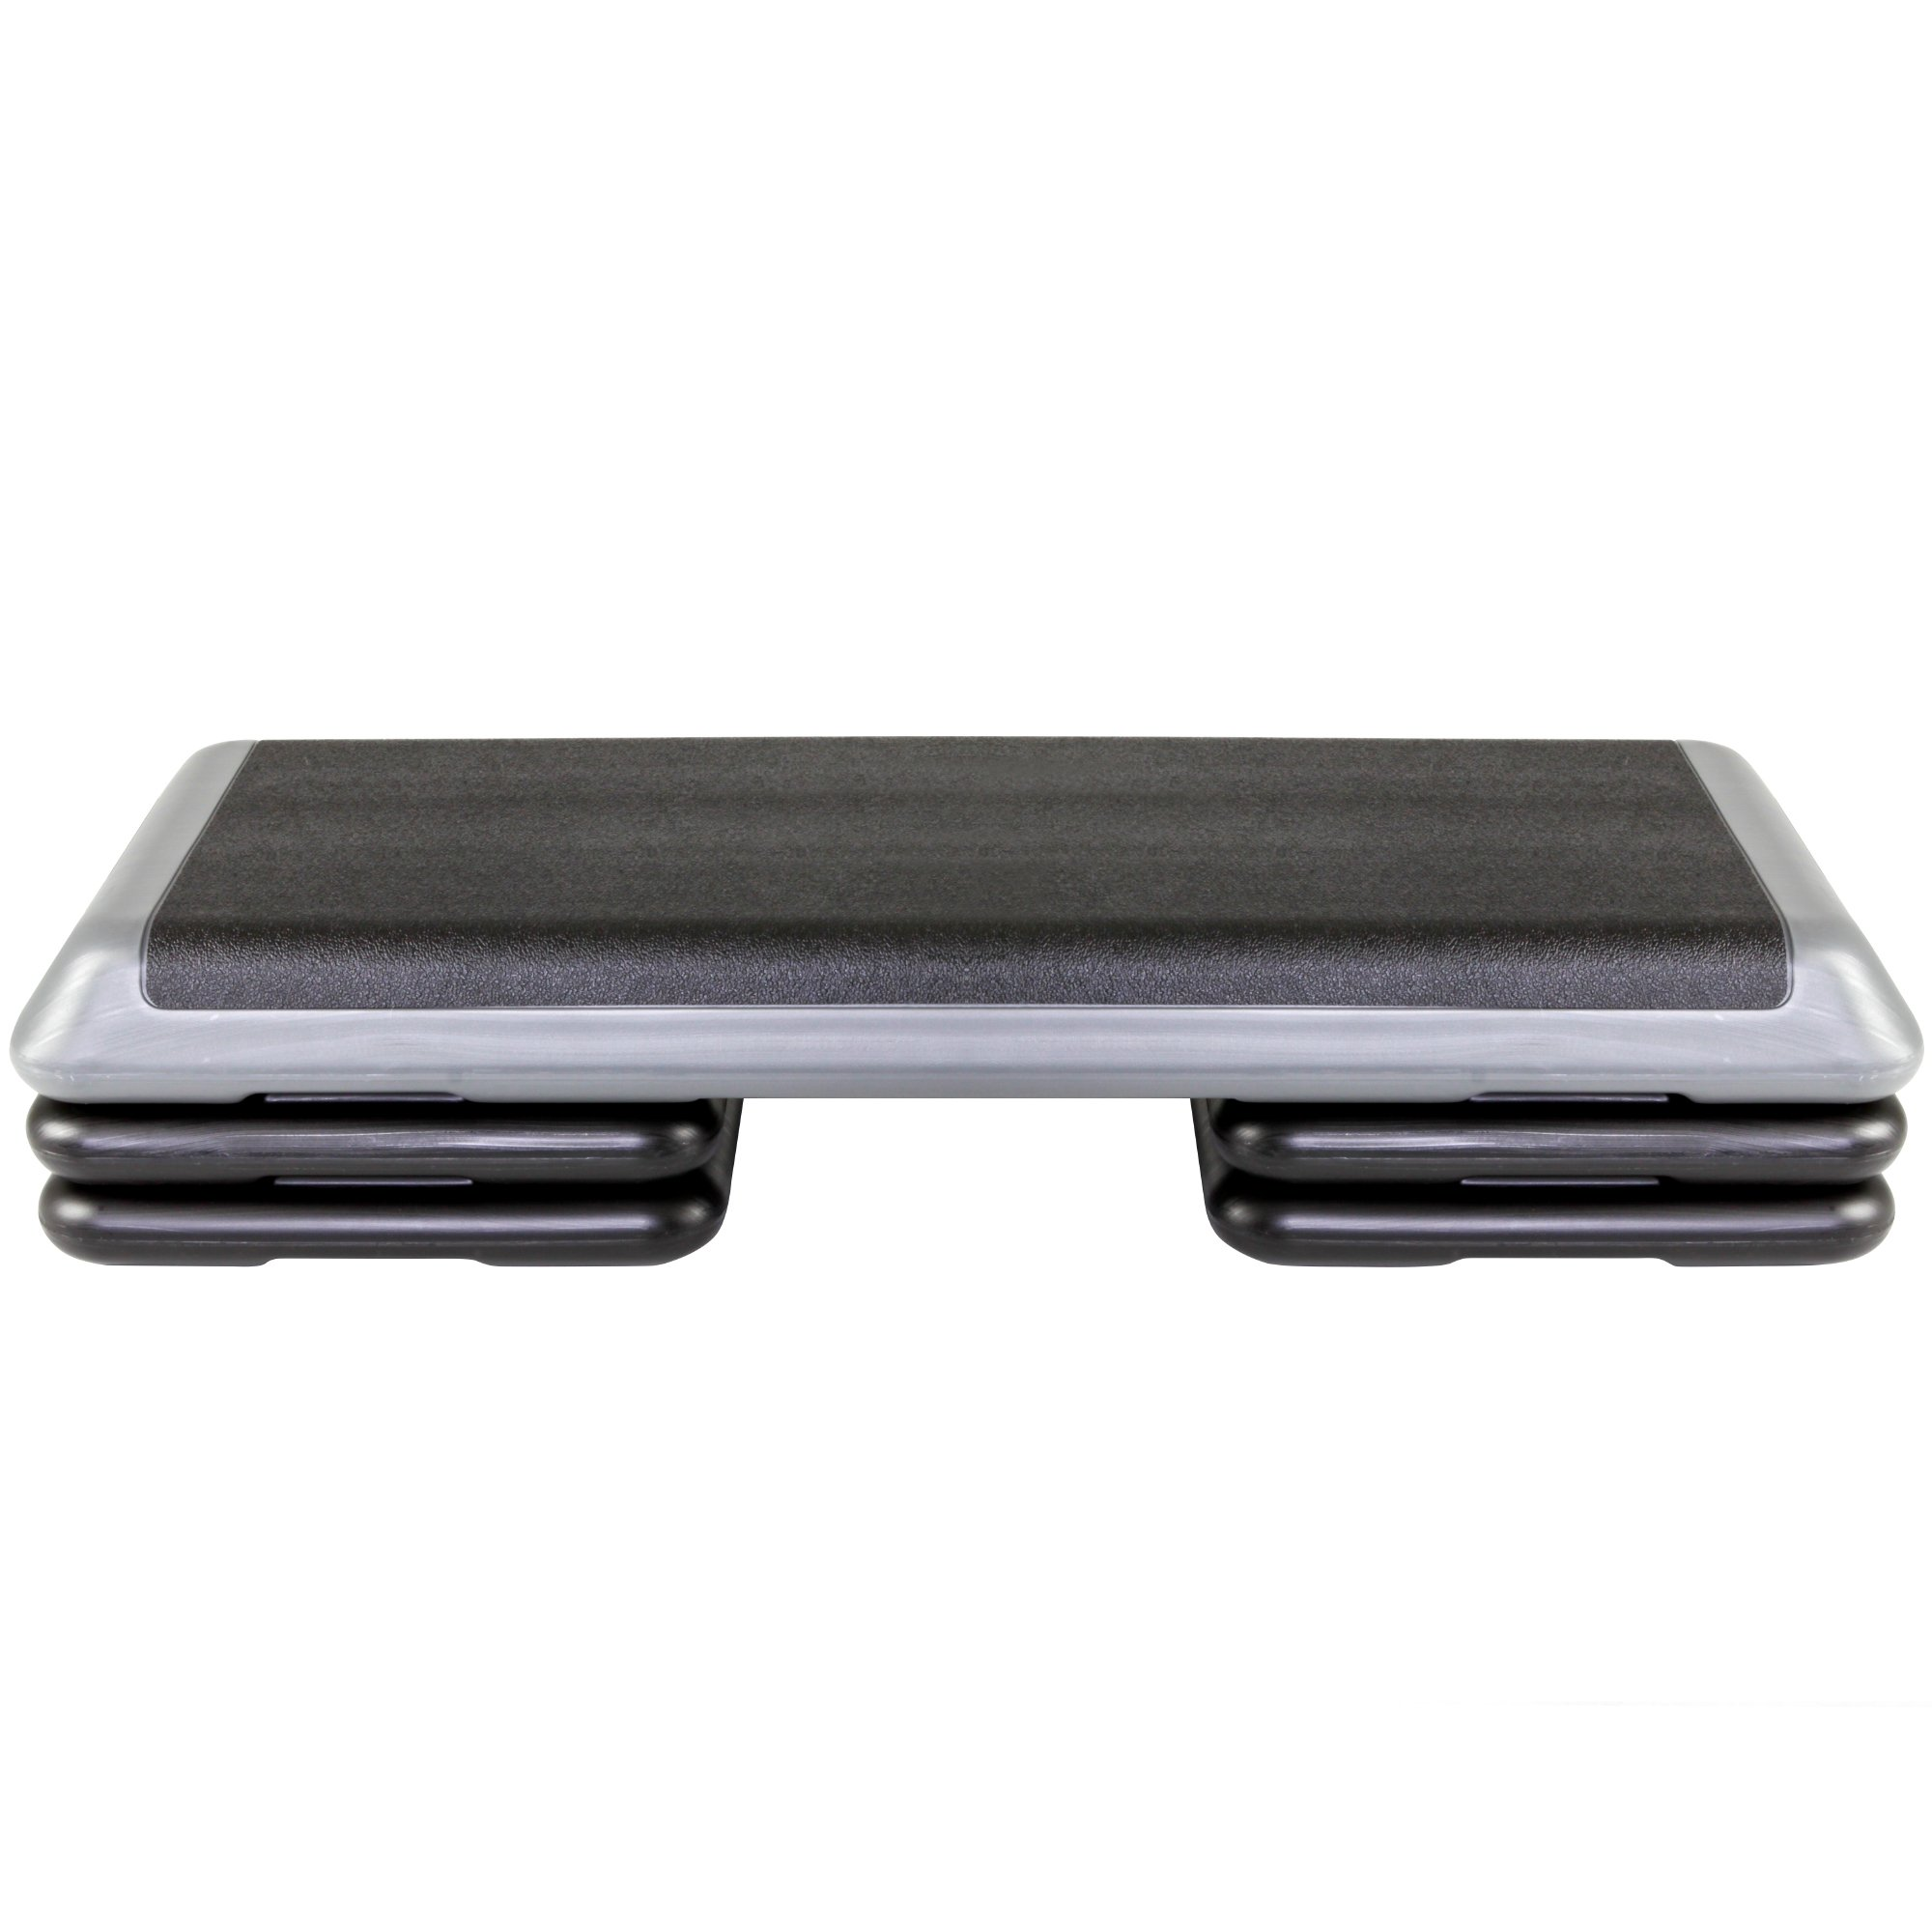 The Step Original Aerobic Platform for Total Body Fitness - Health Club Size with Grey Platform and 4 Original Black Risers